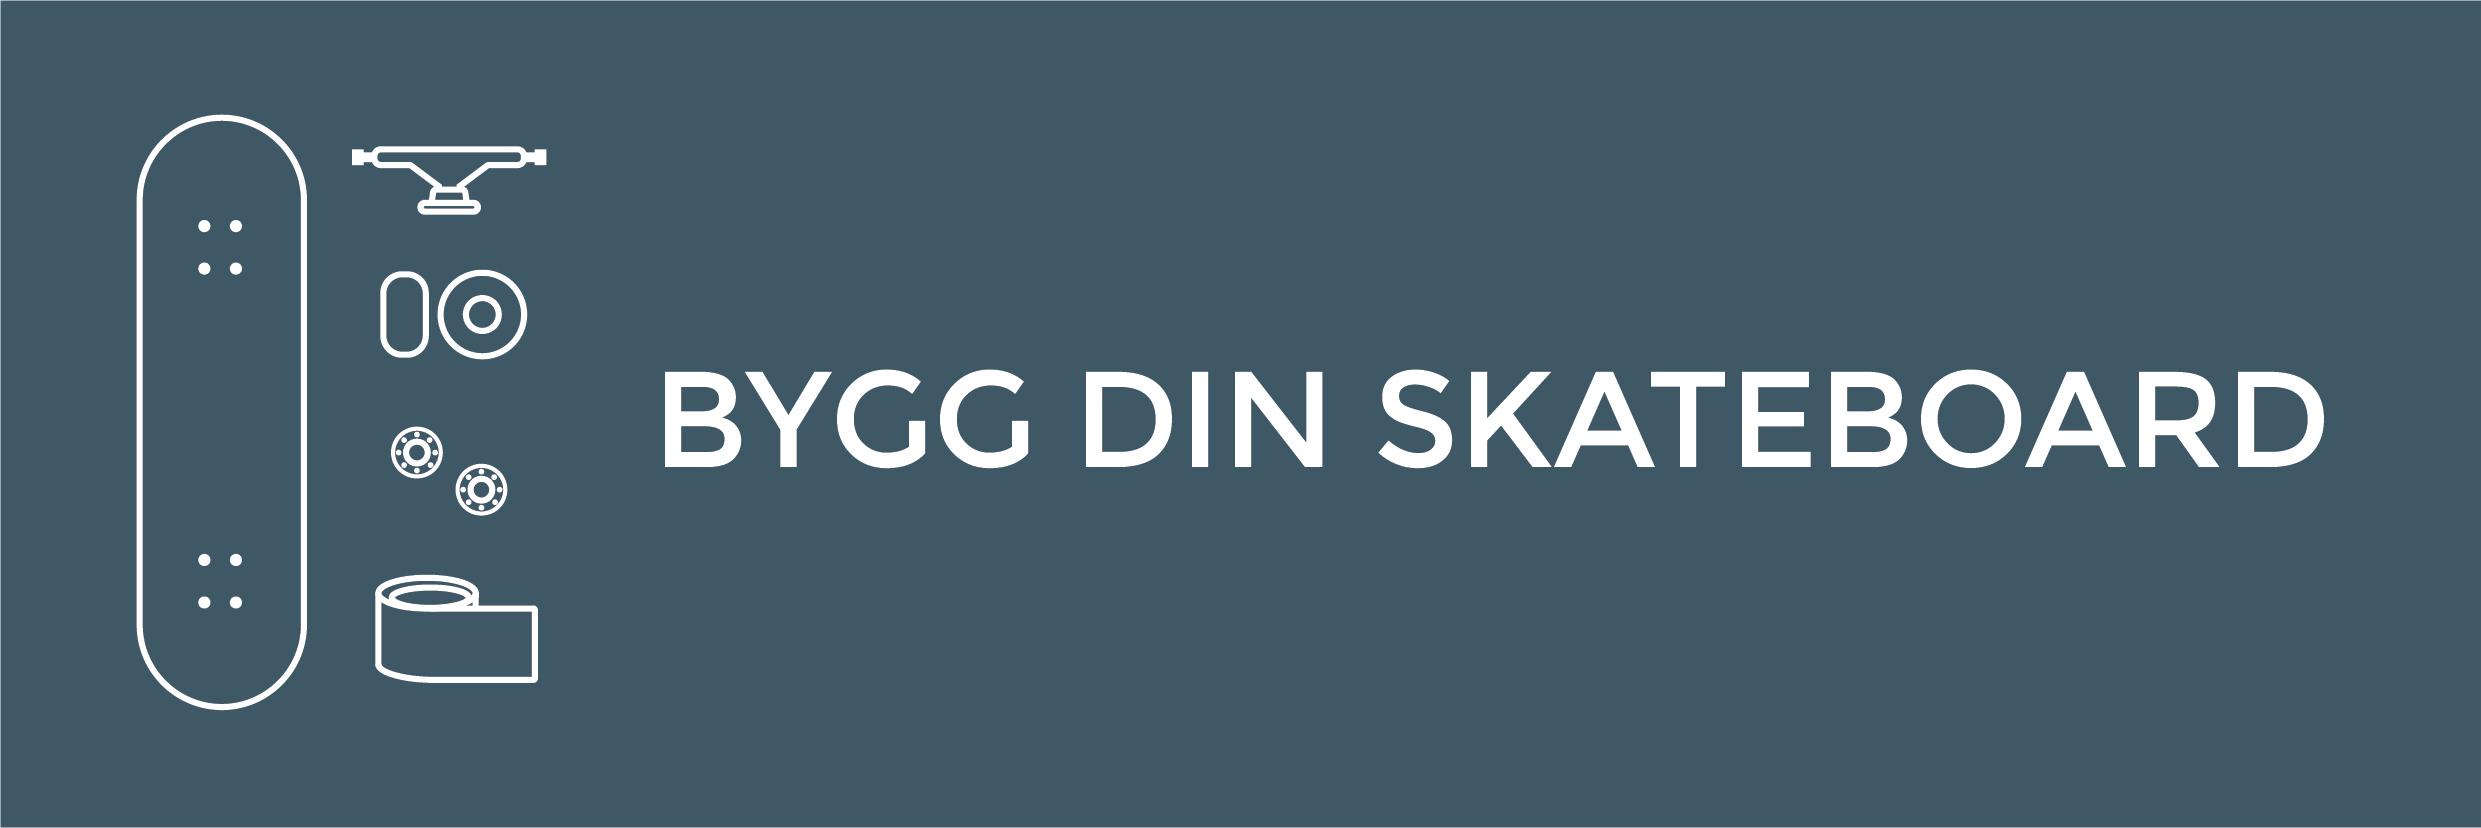 Bygg din skateboard